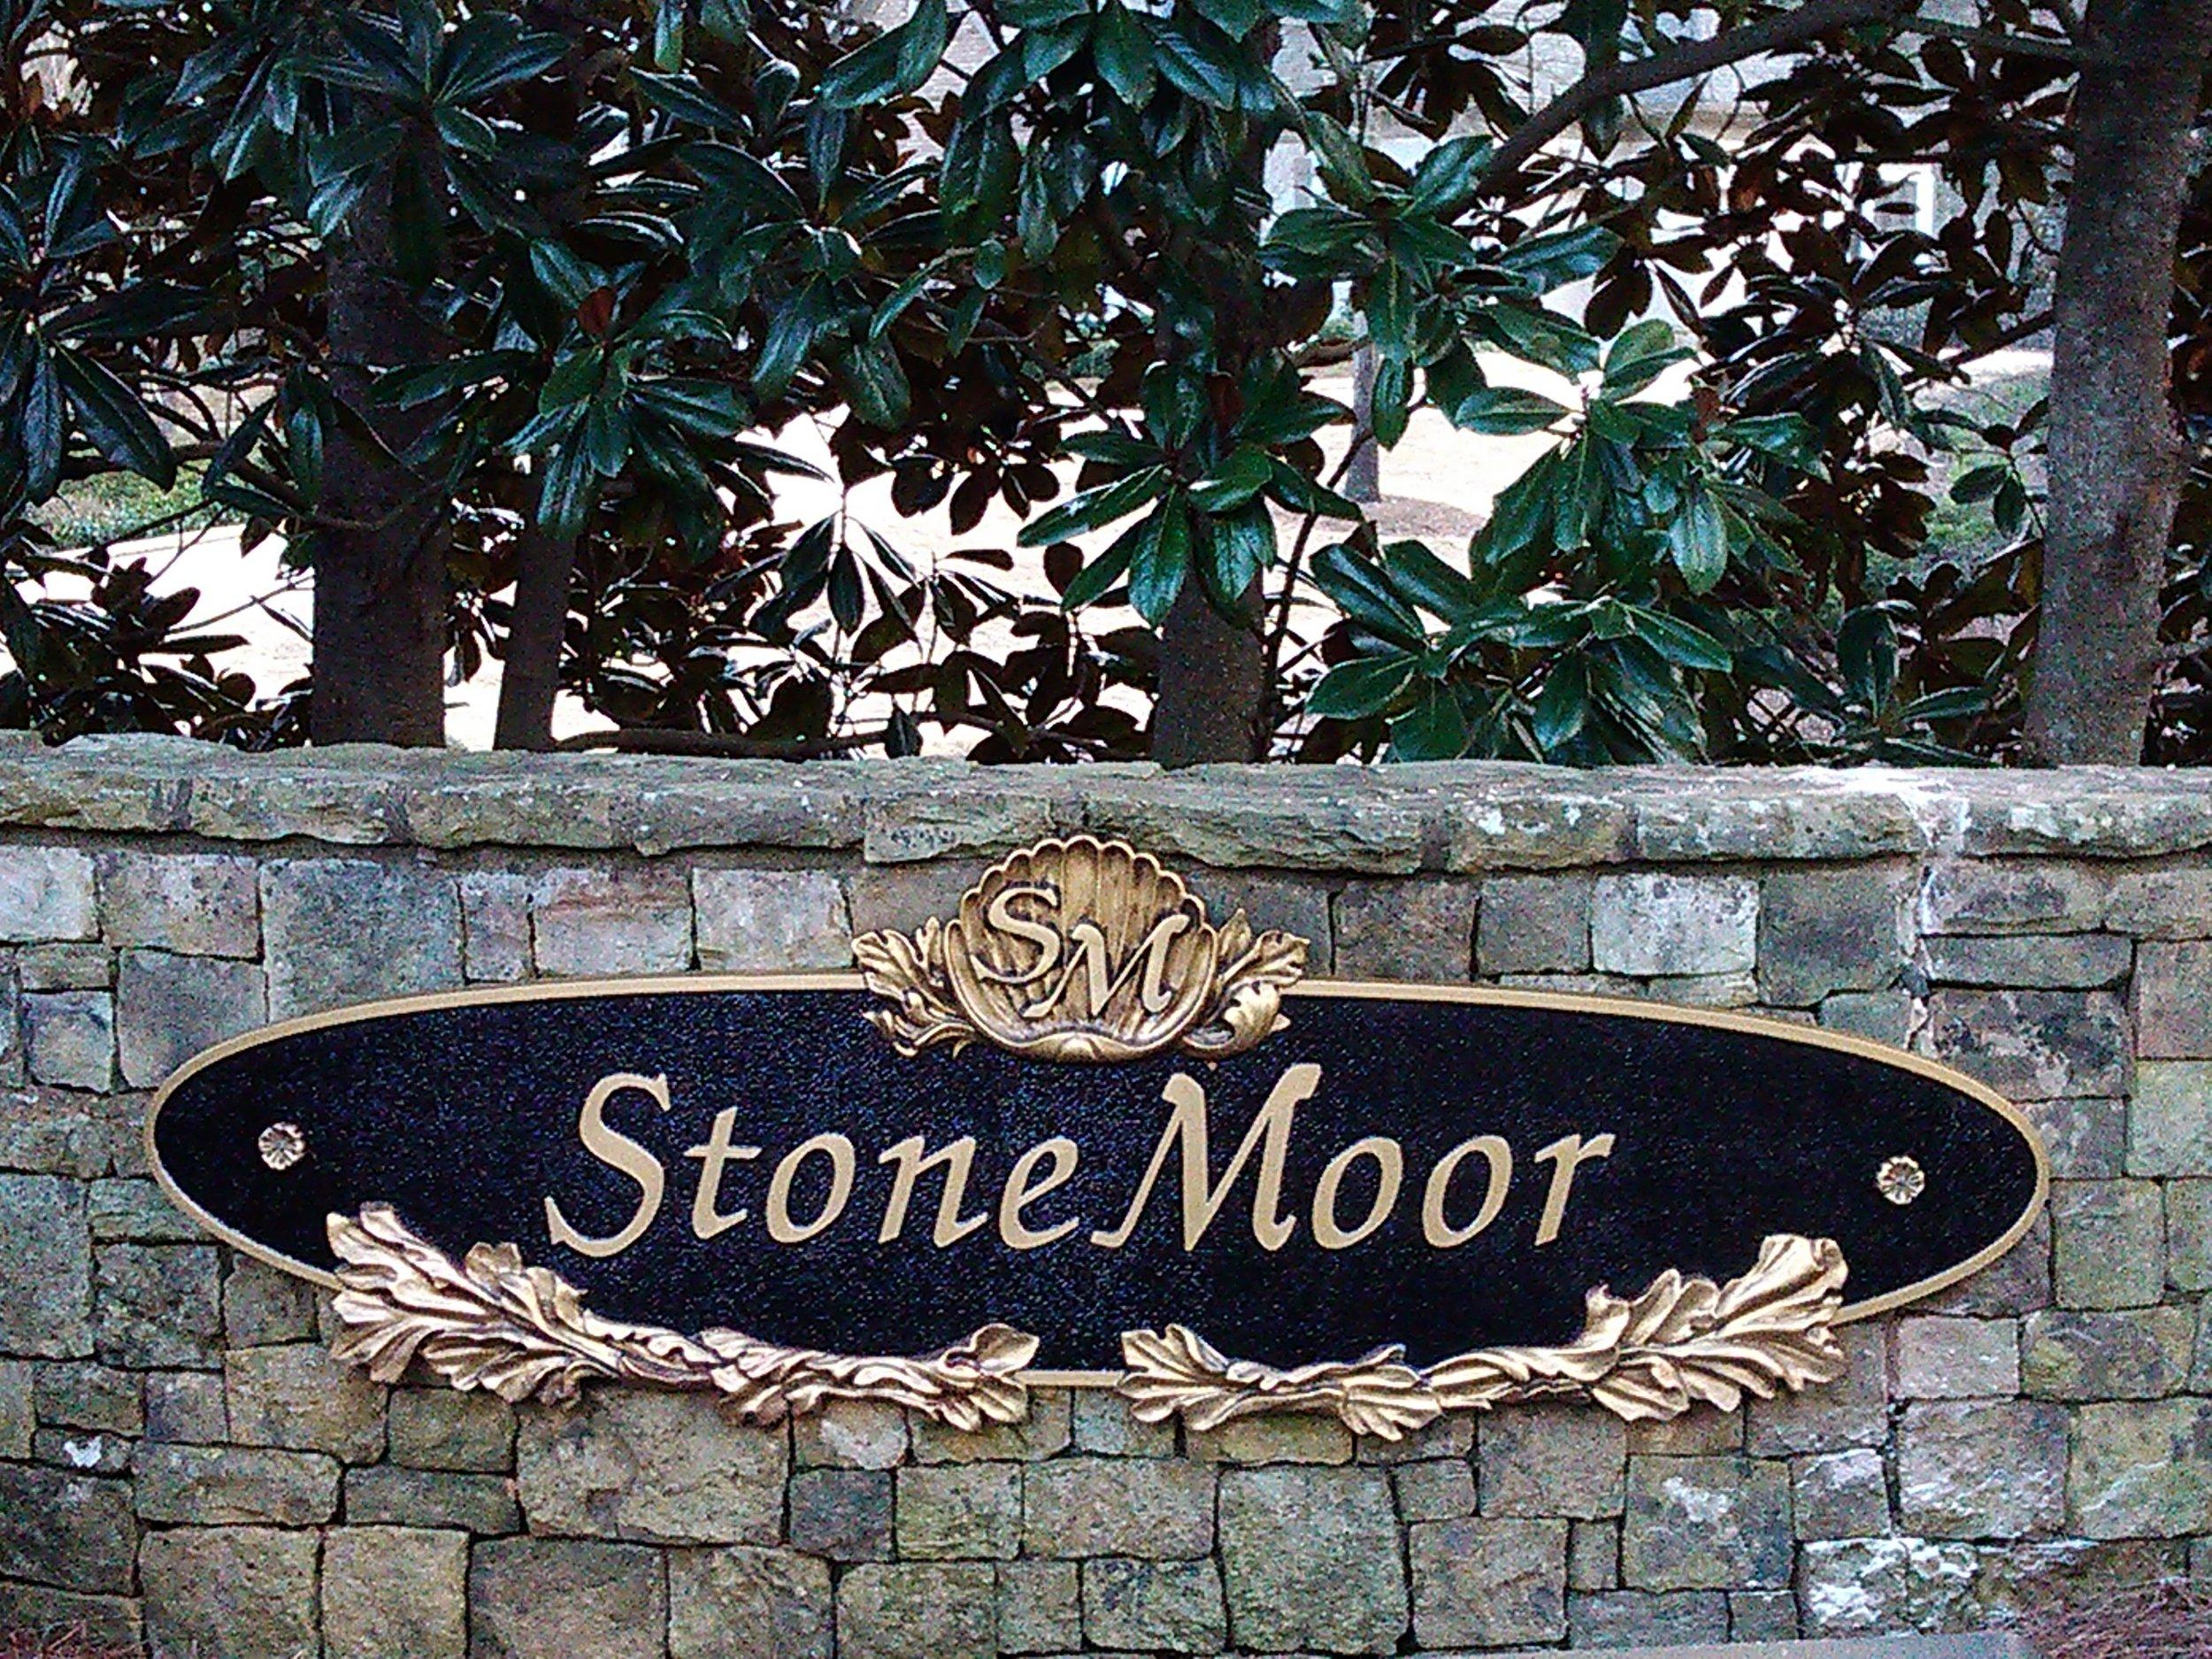 stone moor.jpg